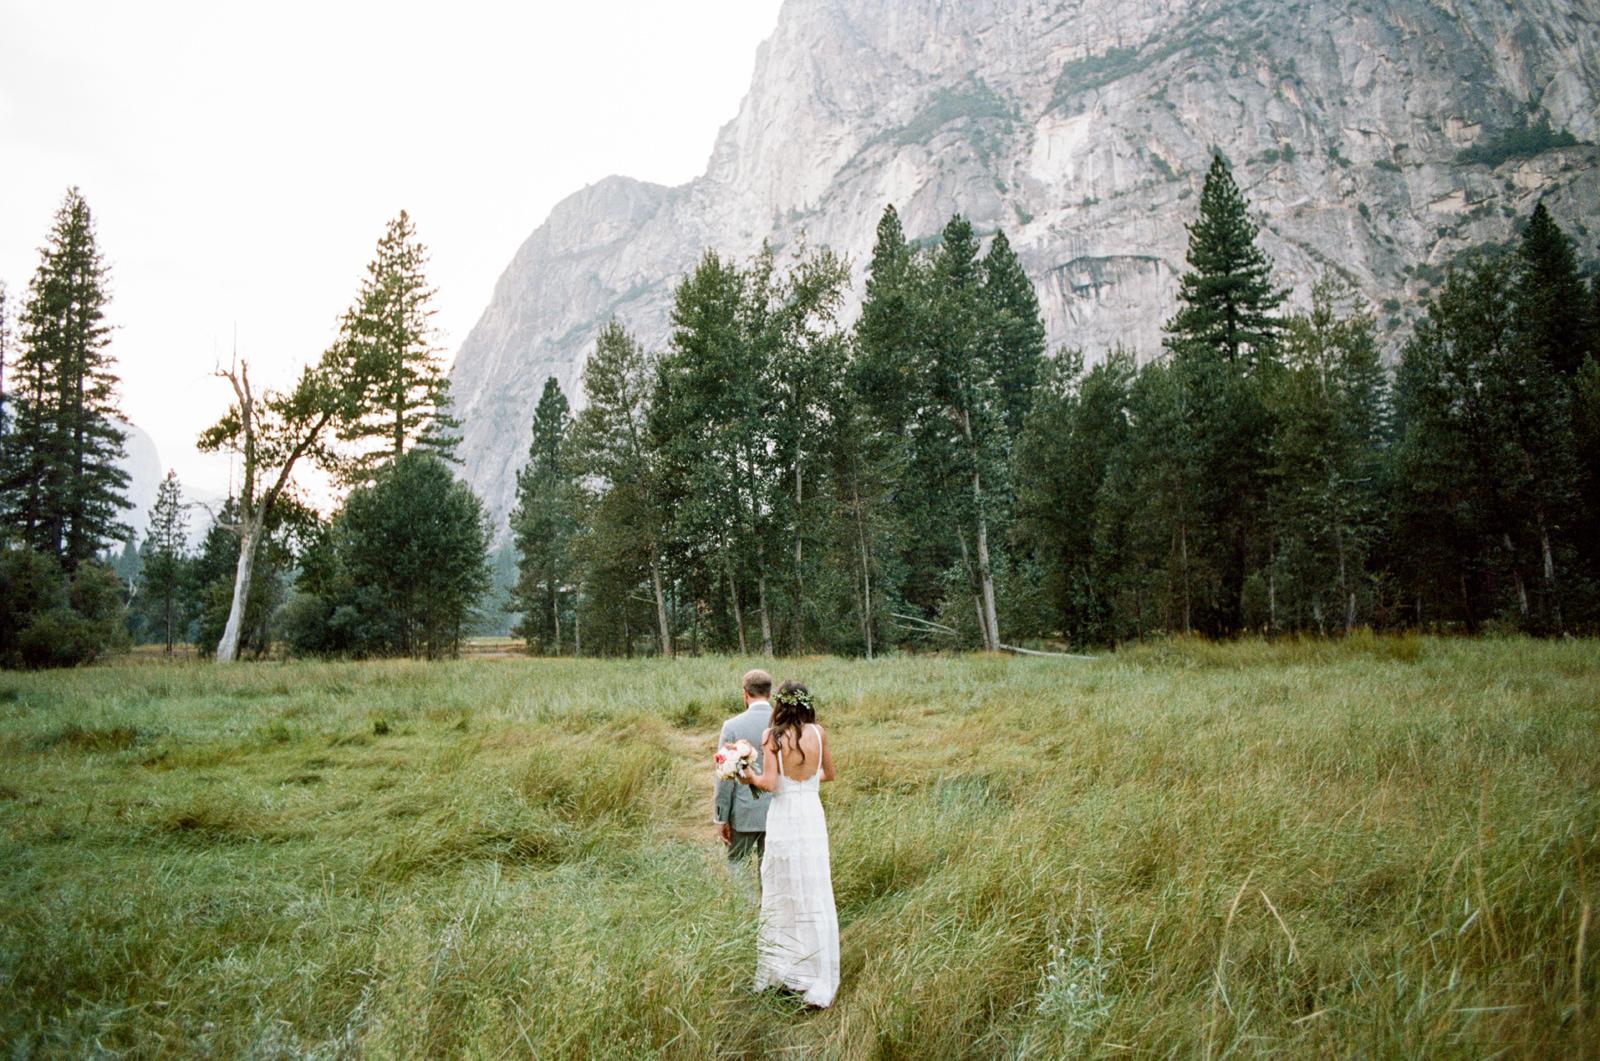 yosemite-intimate-wedding-099 YOSEMITE INTIMATE WEDDING